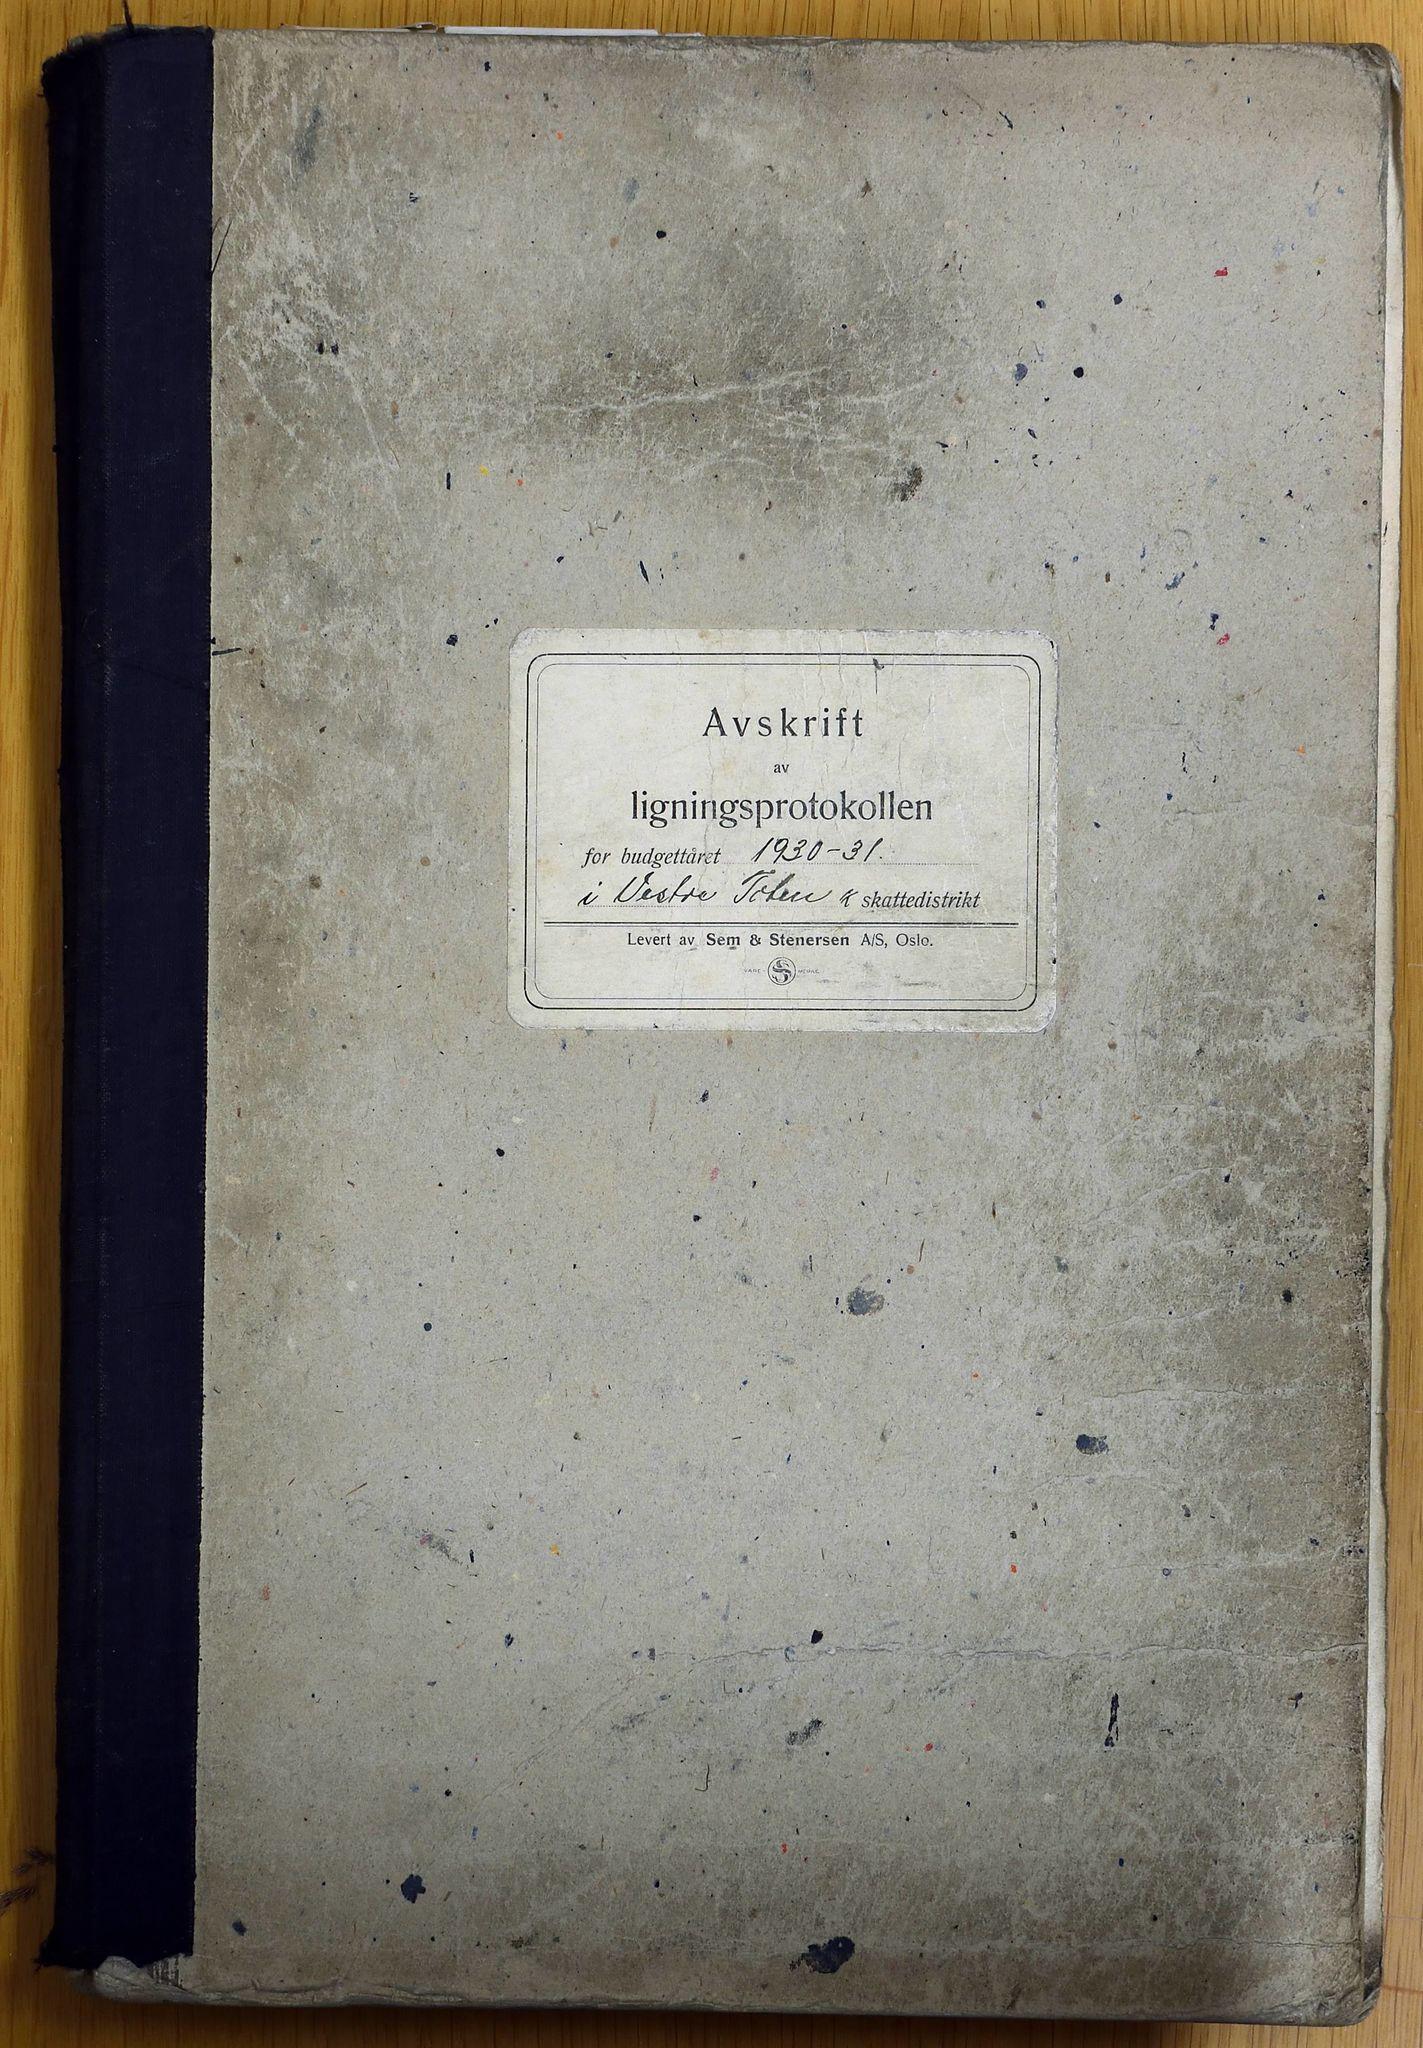 KVT, Vestre Toten kommunearkiv: Avskrift av ligningsprotokollen for budsjettåret 1930-1931 i Vestre Toten skattedistrikt, 1930-1931